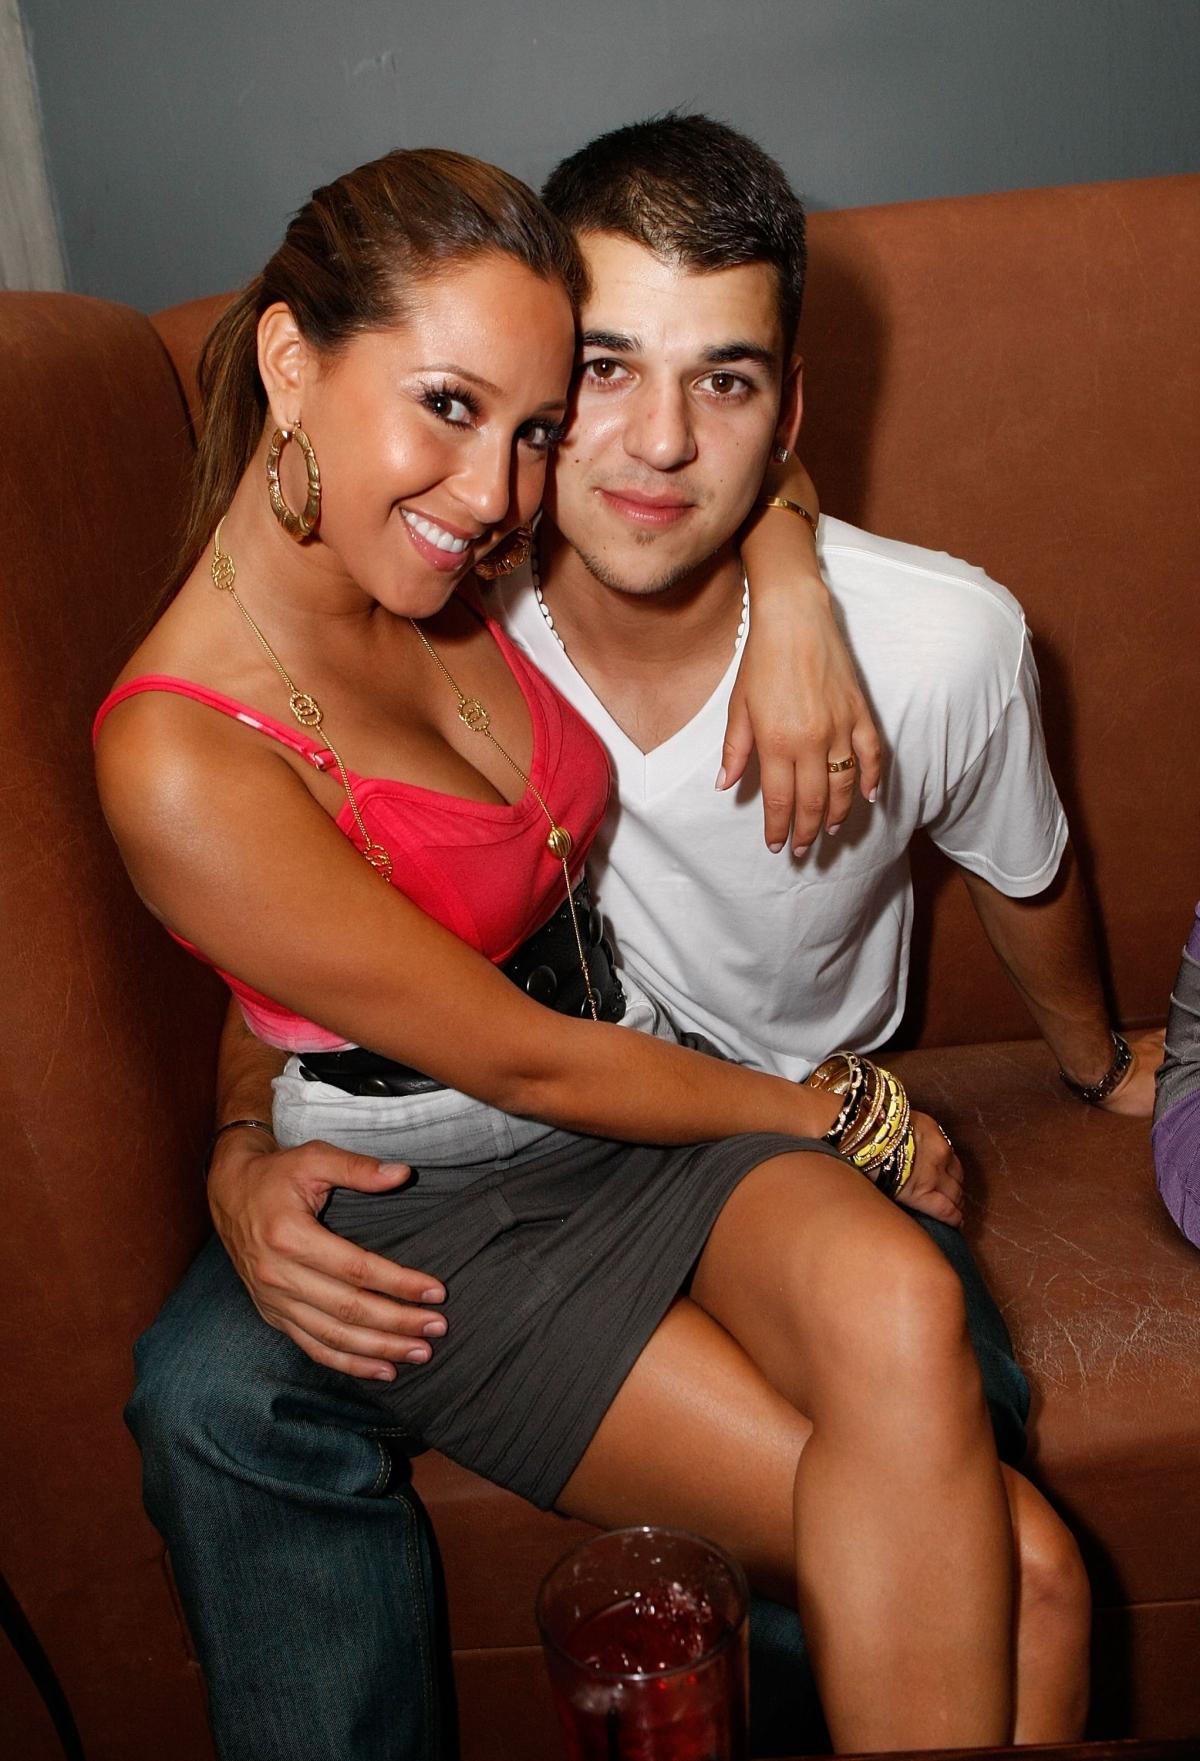 Rob Kardashian with Singer Adrienne Bailon